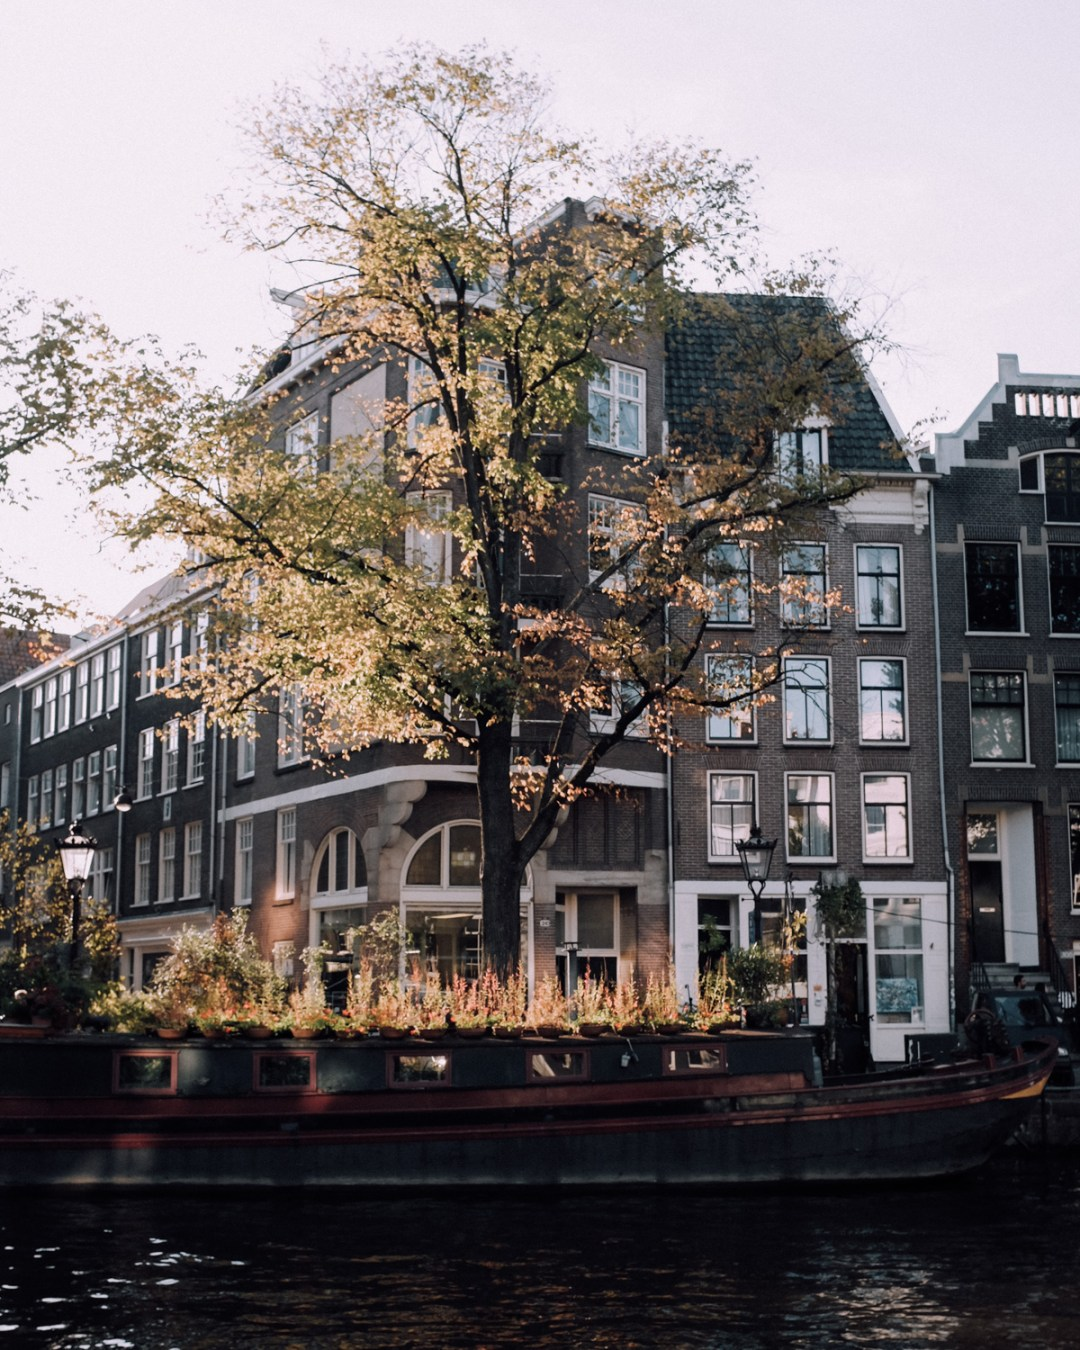 inastil, Ü50Blog, Amsterdam, Citytrip, Reiseblogger, Amsterdamtipps, Städtereise, Ü50Reiseblogger, Herbst in Amstrdam-26